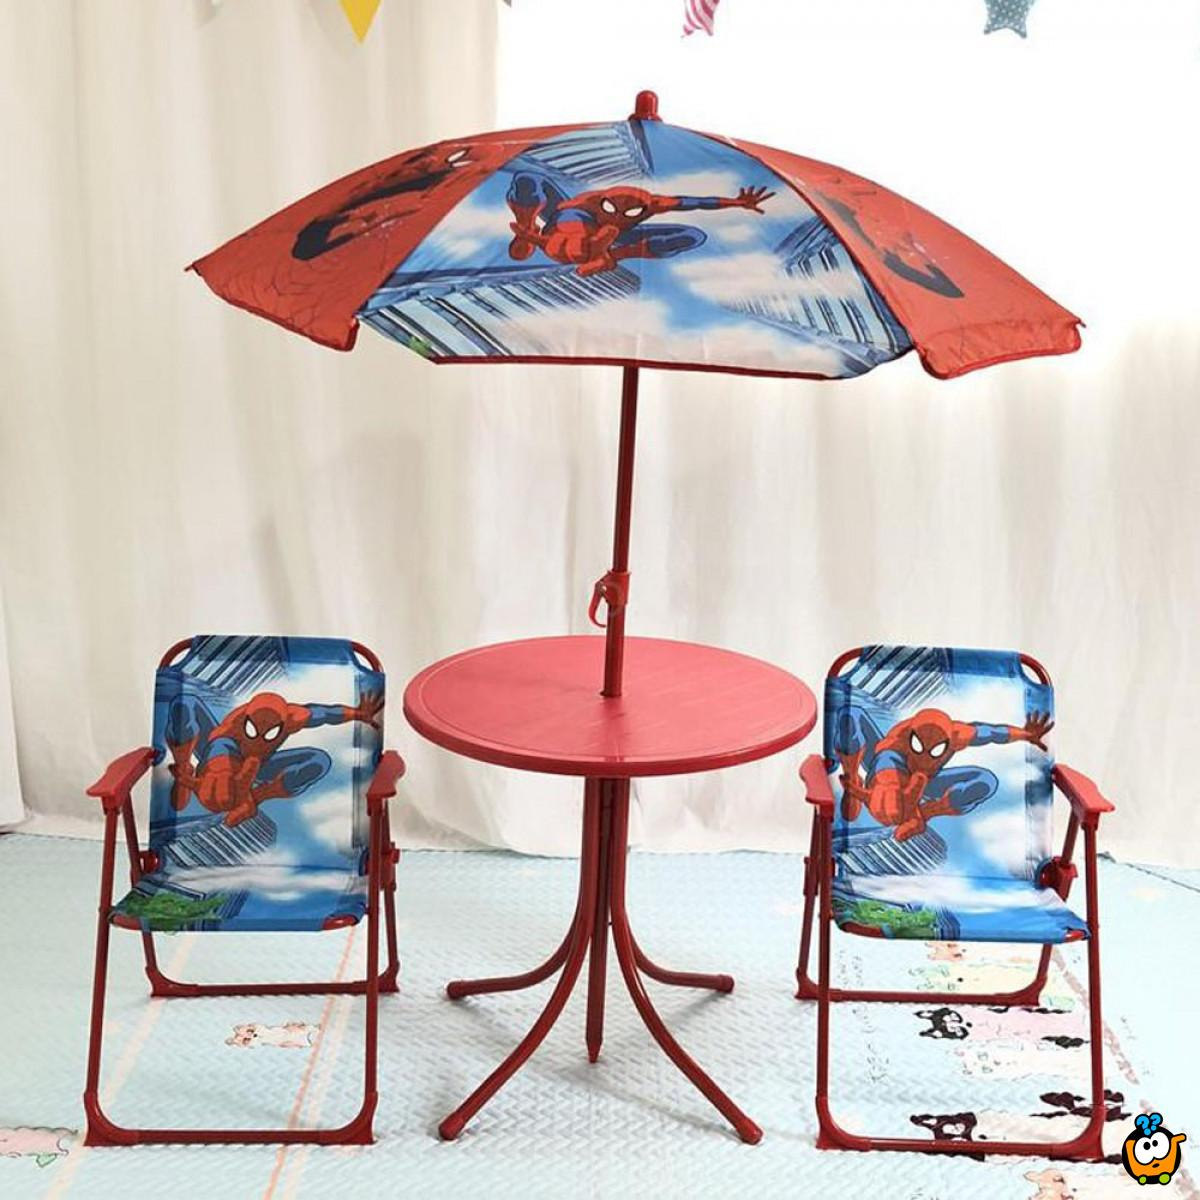 Komplet garnitura za dečake sa suncobranom - SPIDERMAN